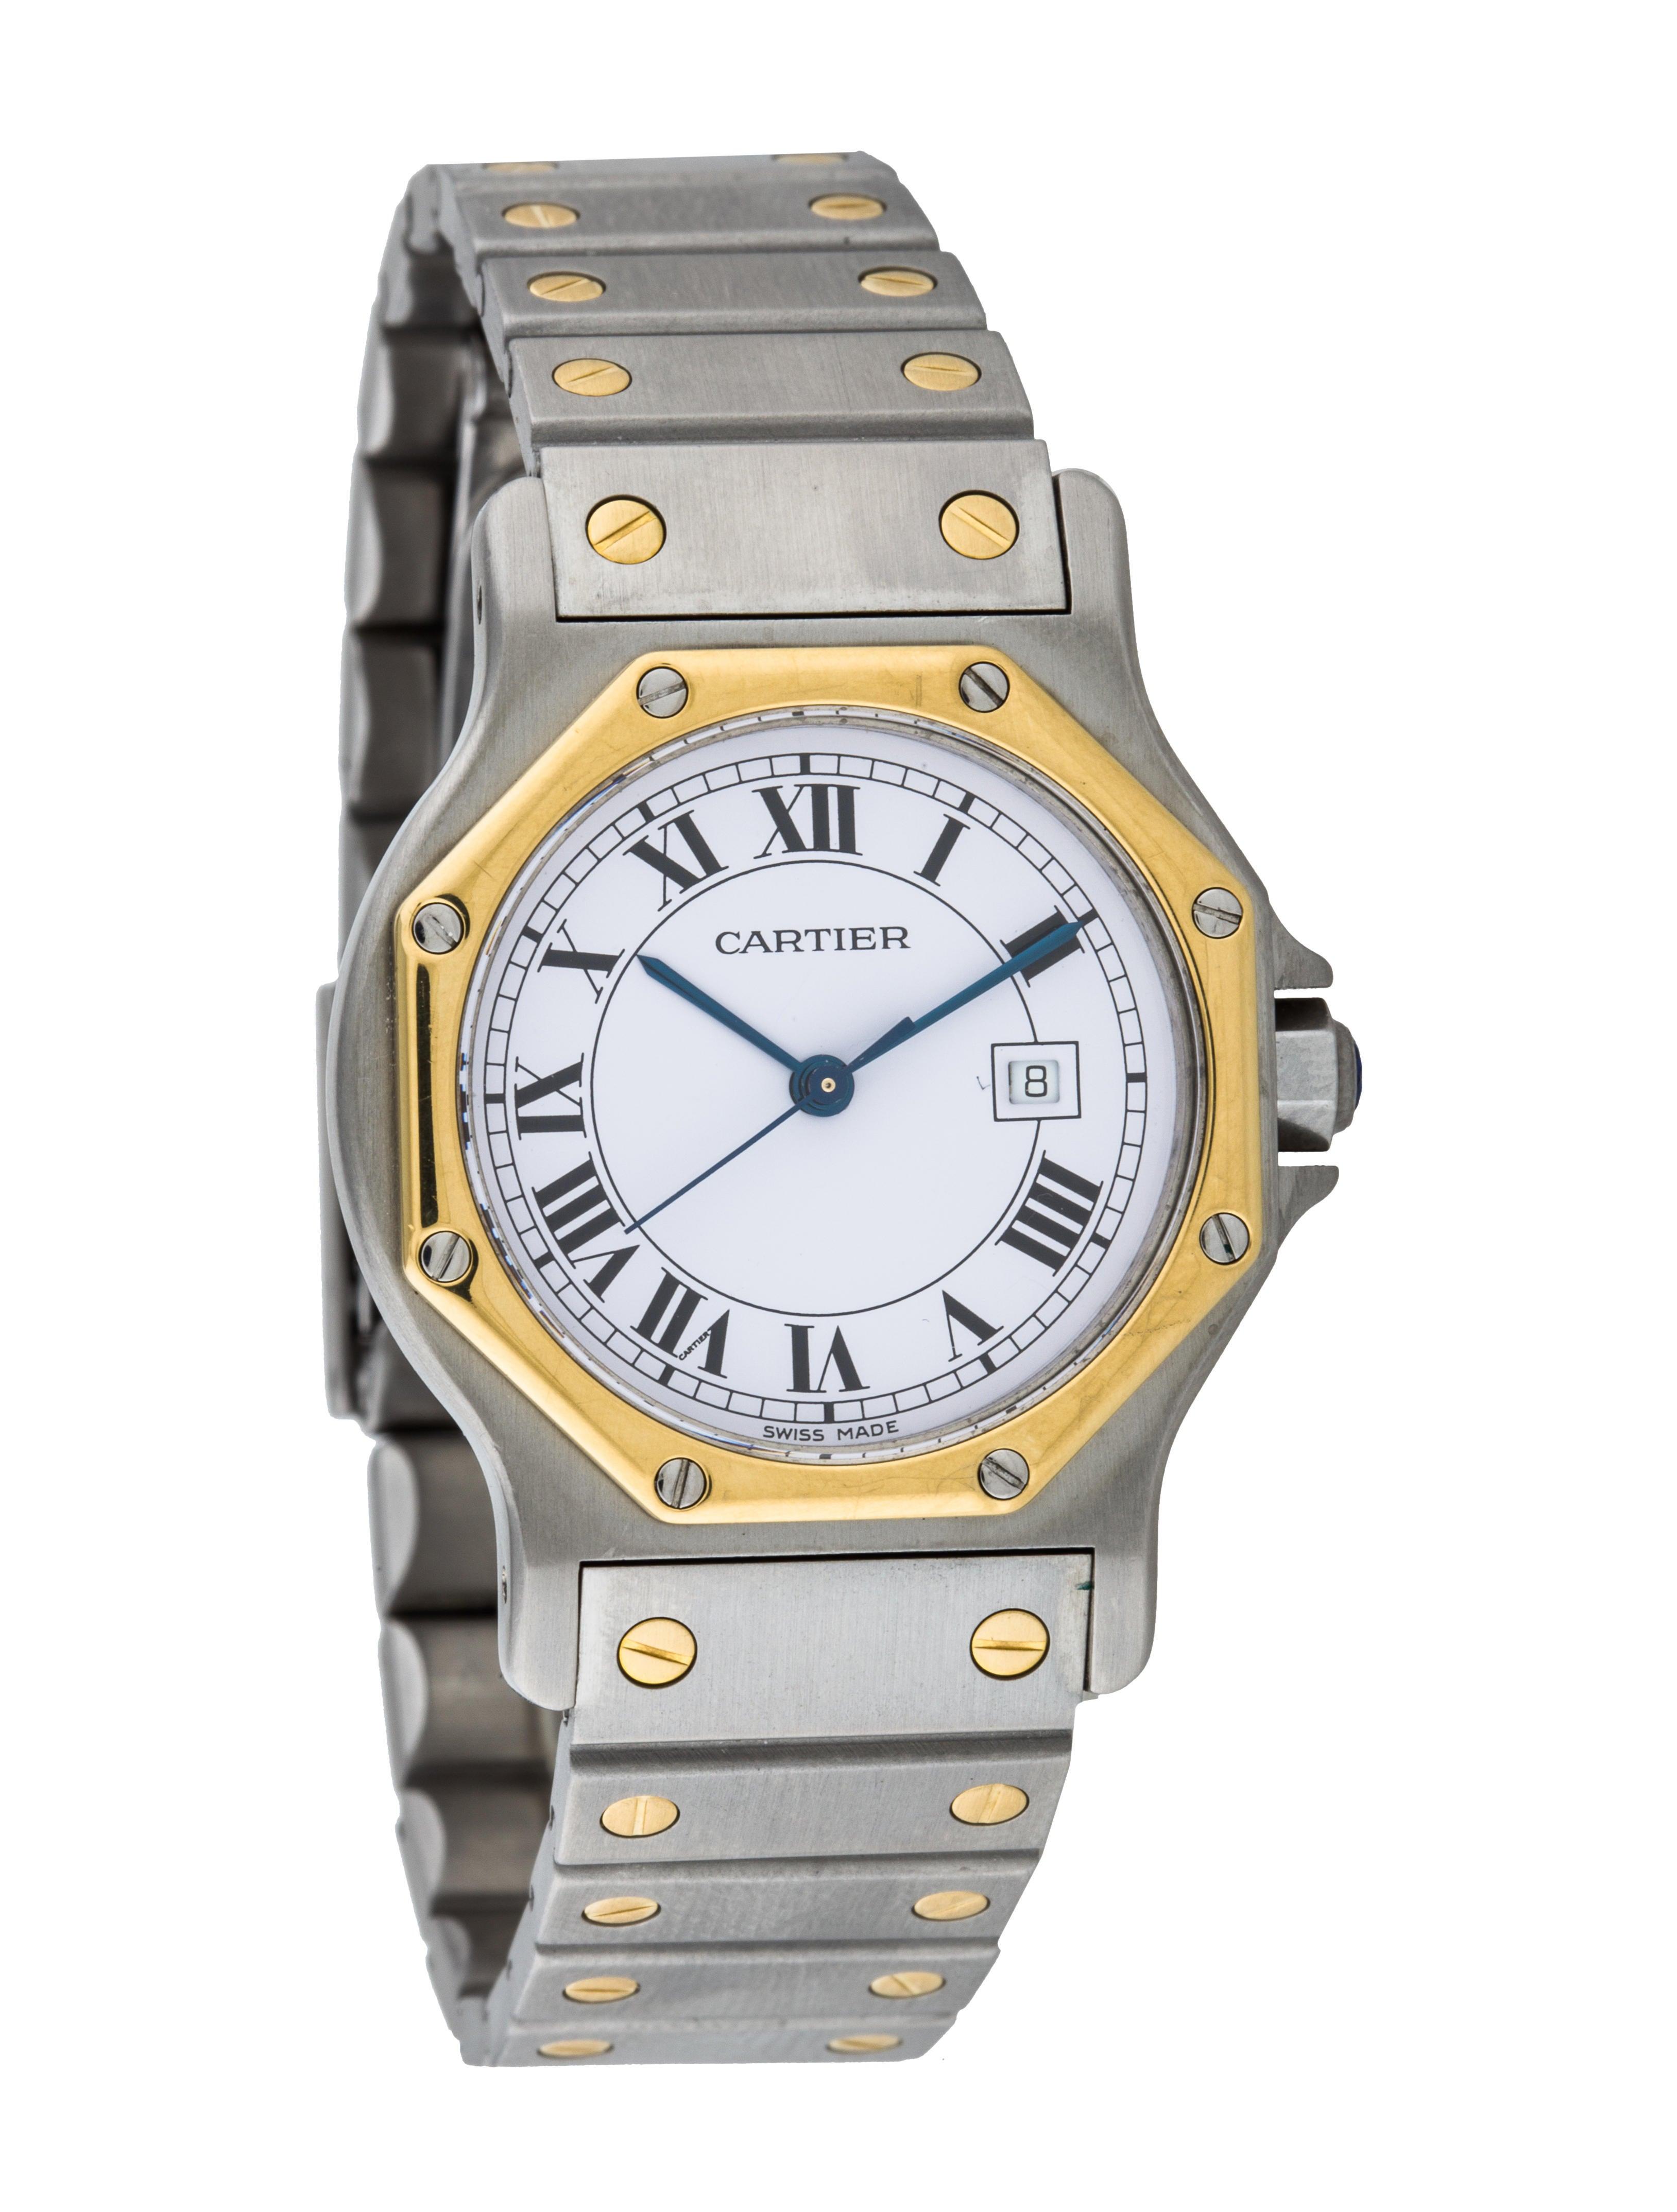 Cartier Santos Octagon Watch - Bracelet